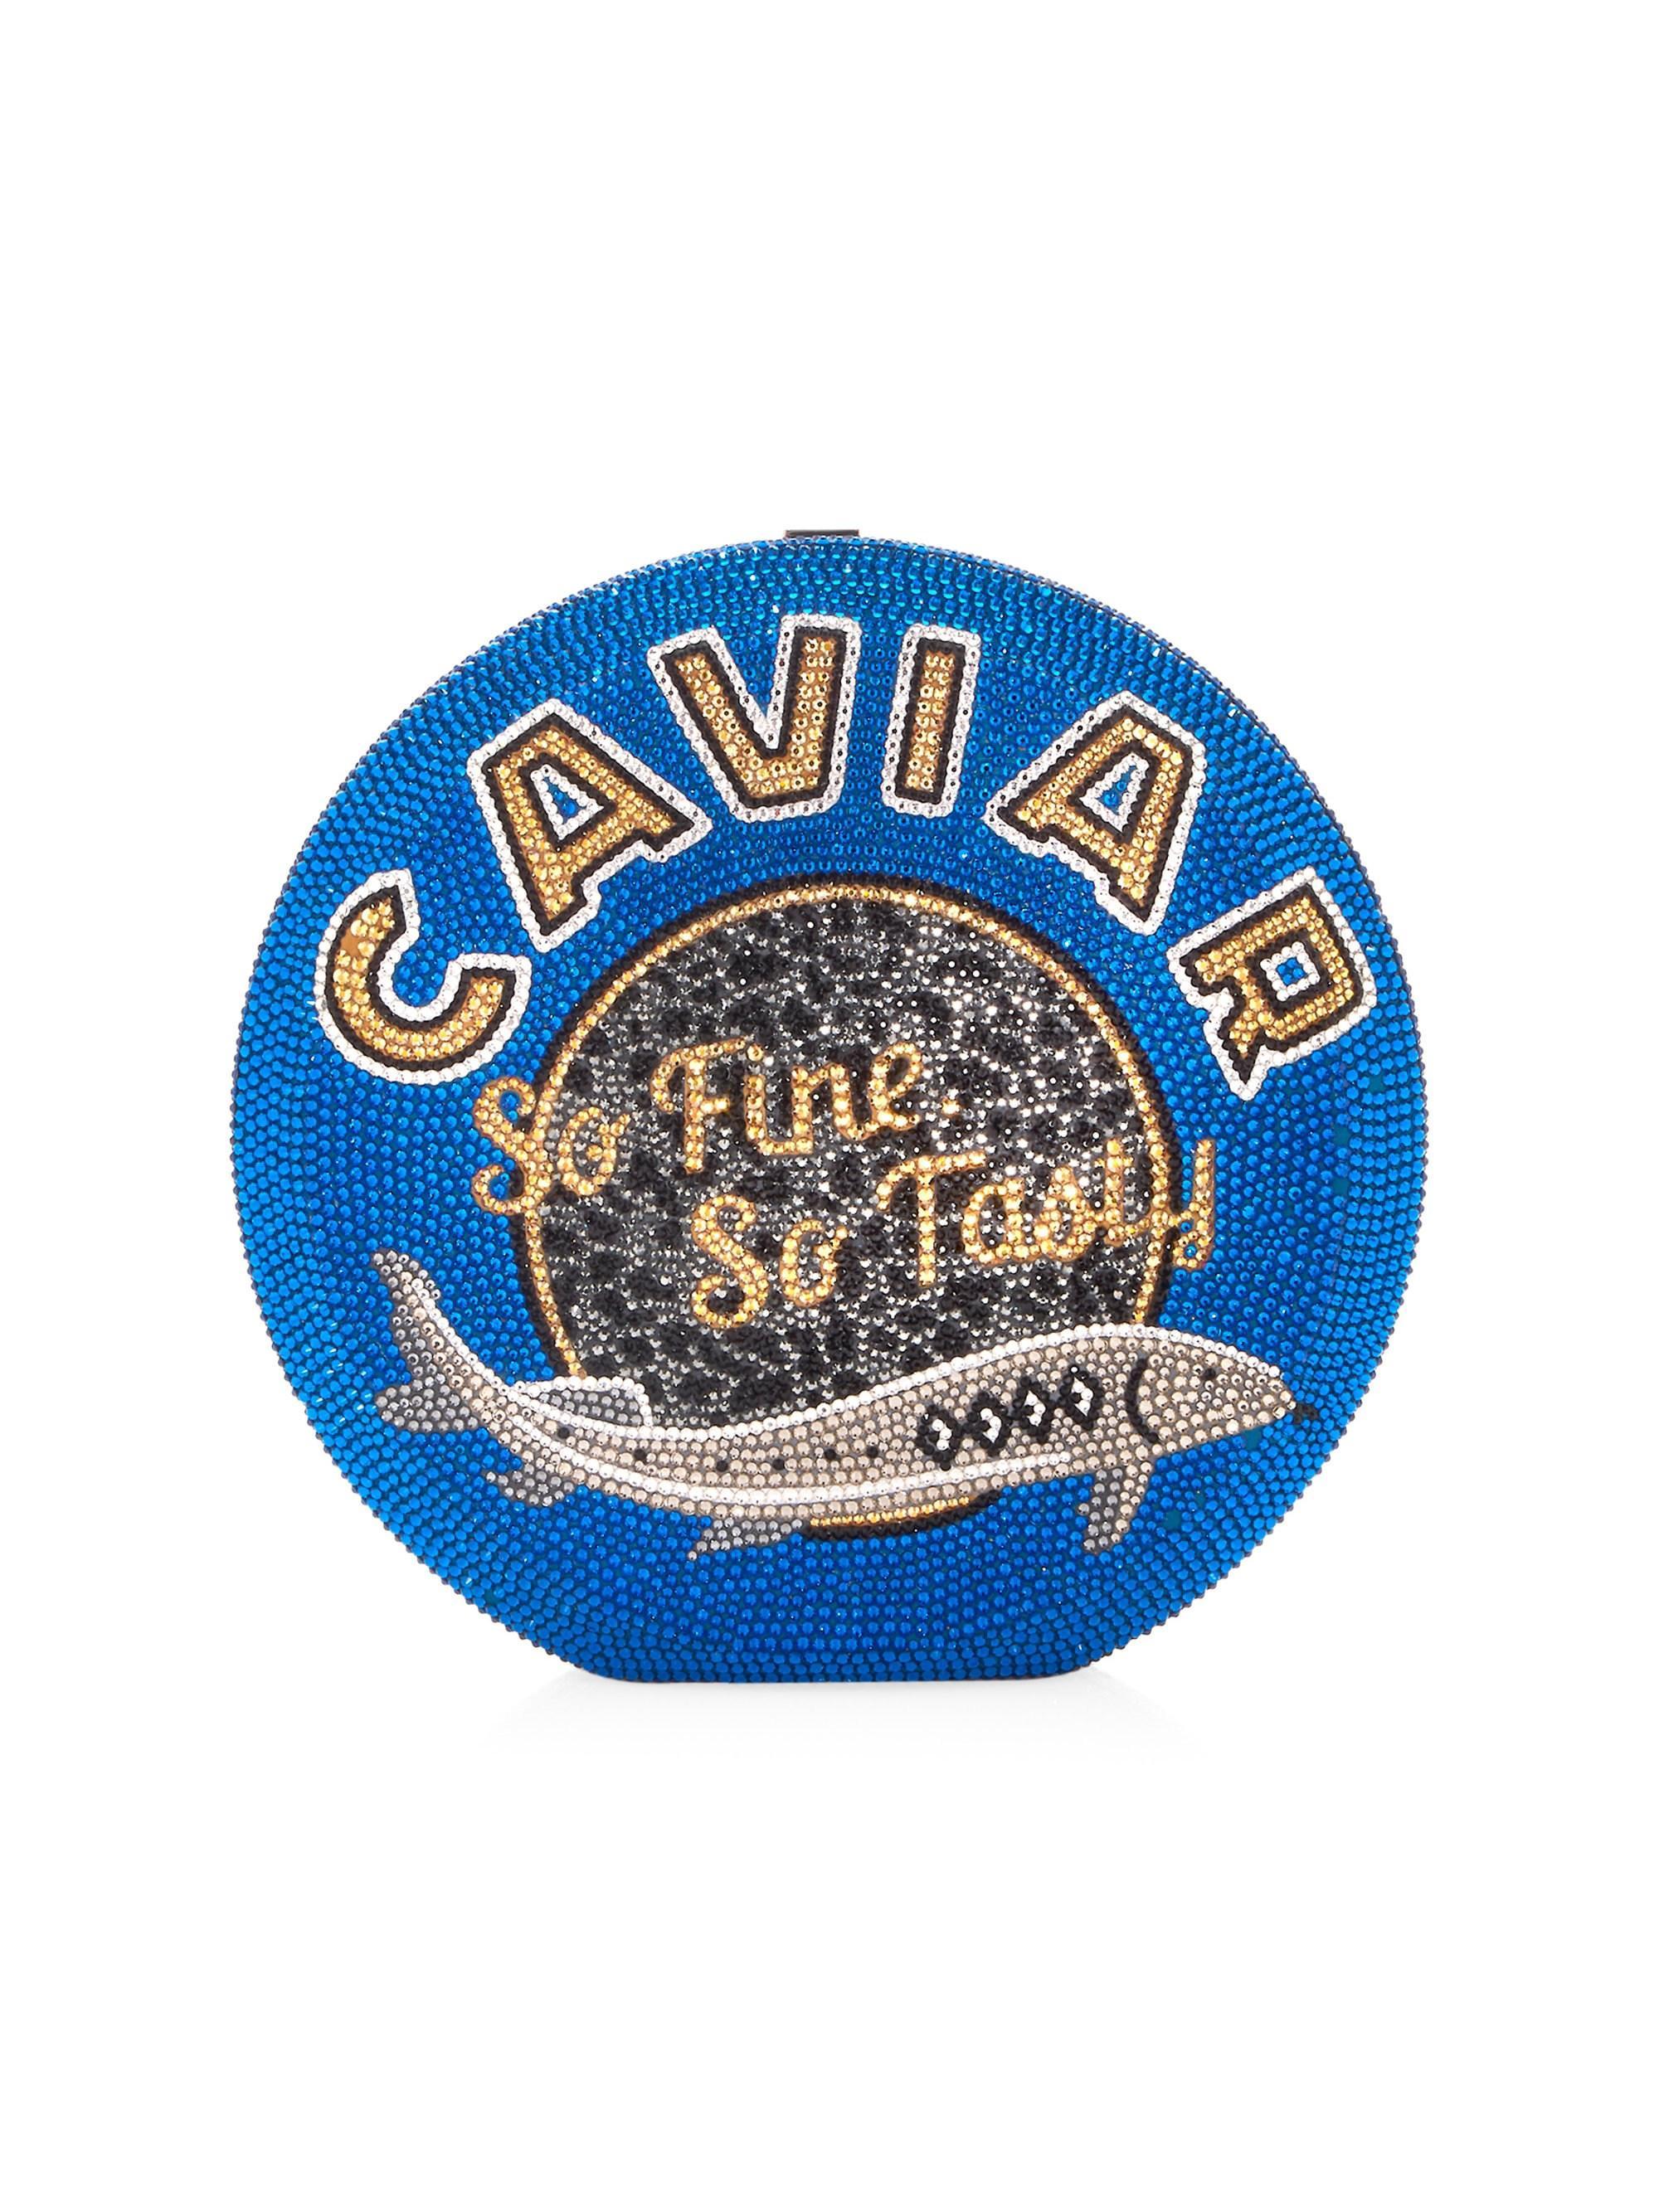 Judith Leiber Blue Crystal Caviar Disc Clutch